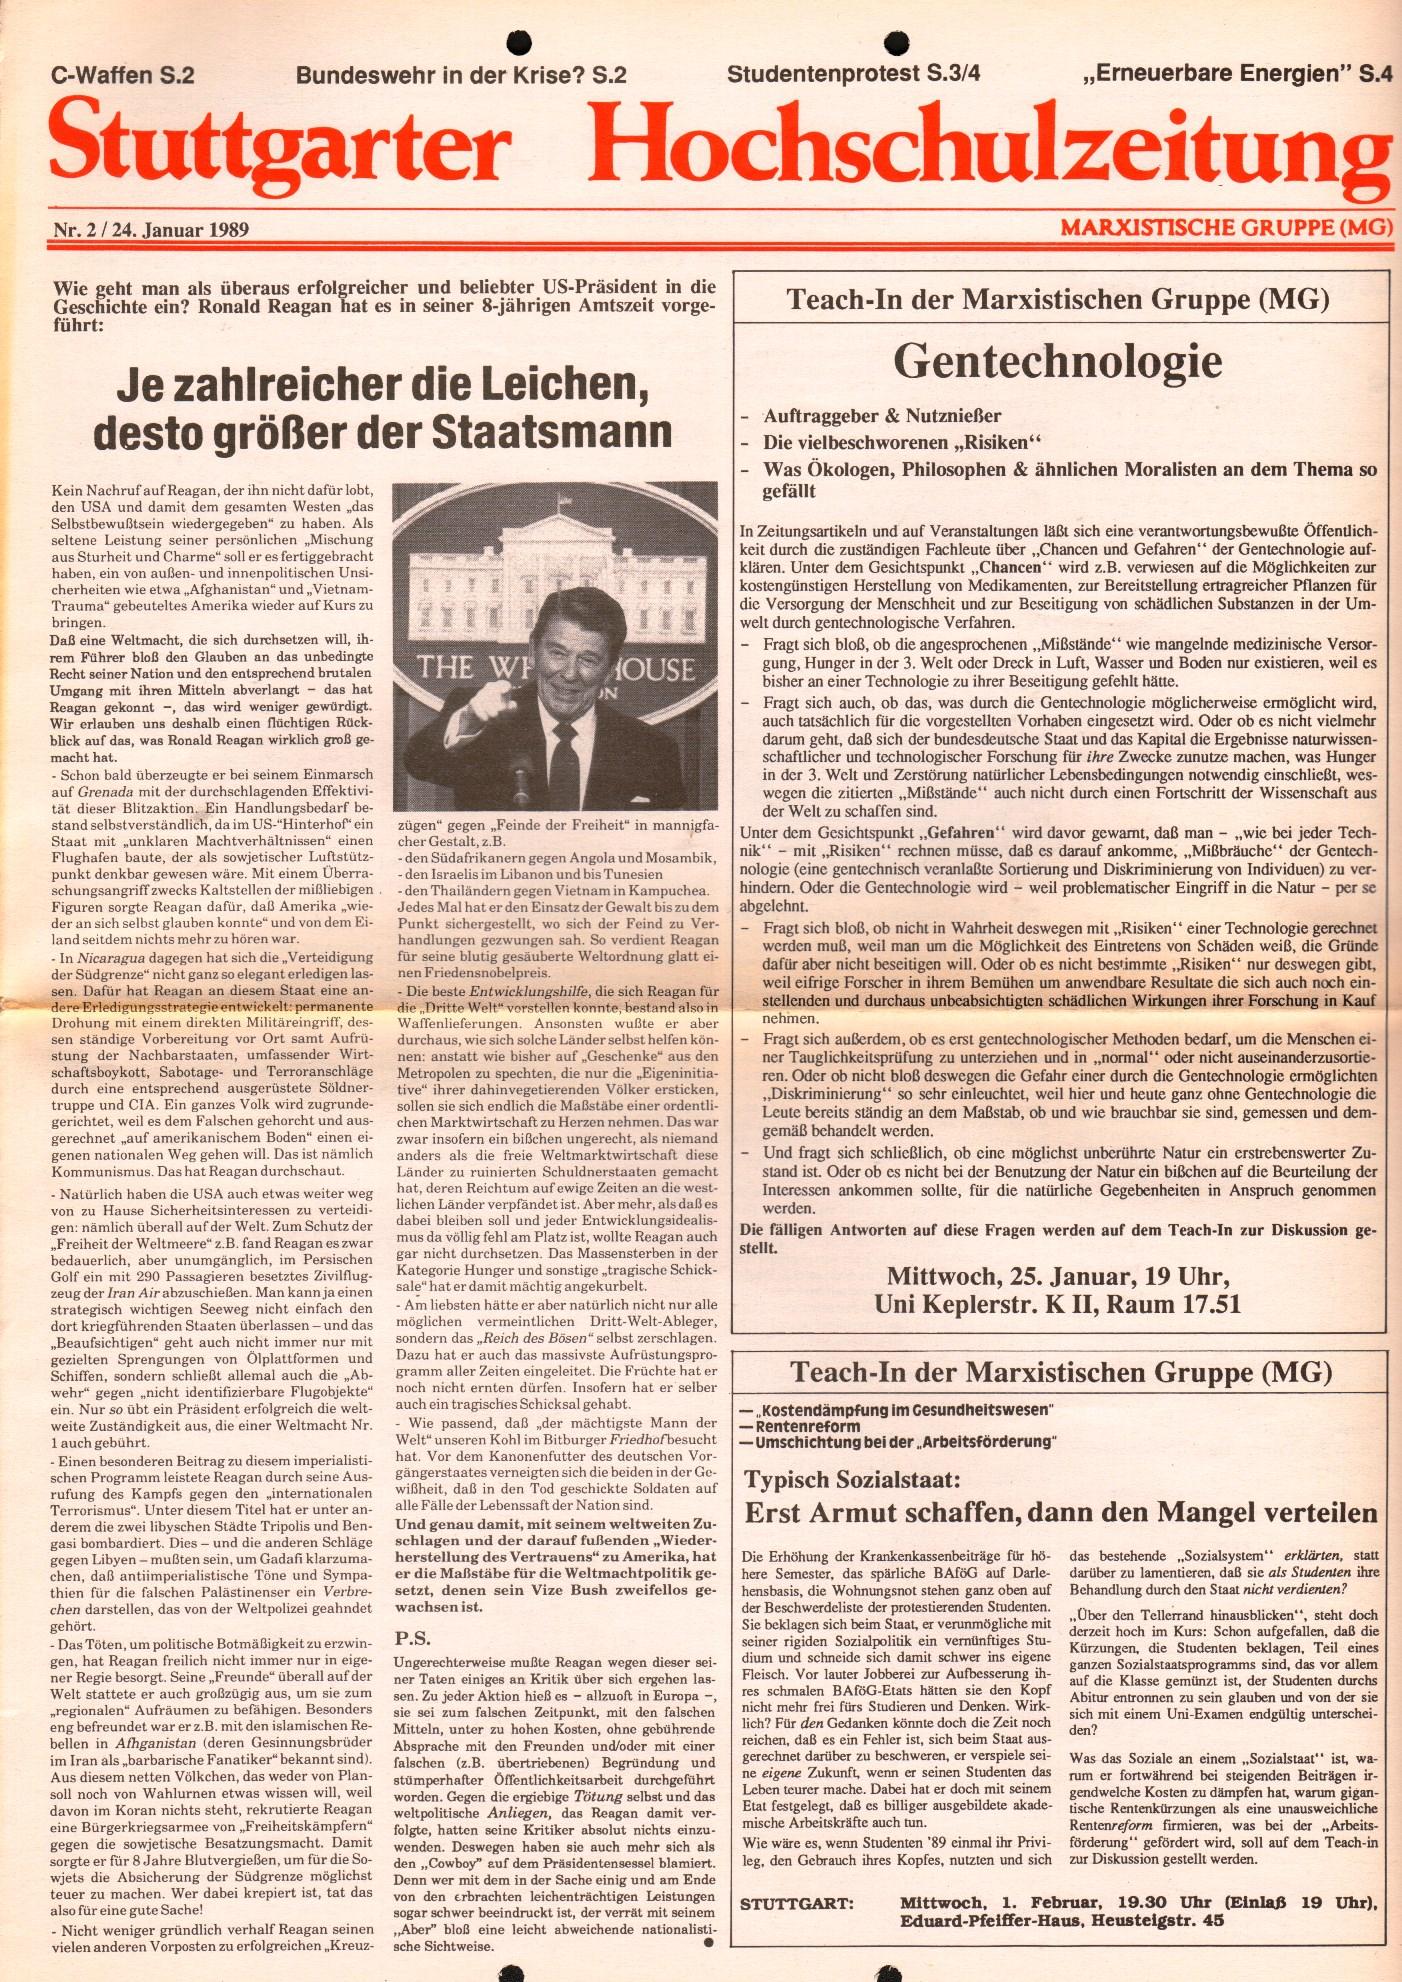 Stuttgart_MG_Hochschulzeitung_1989_02_01